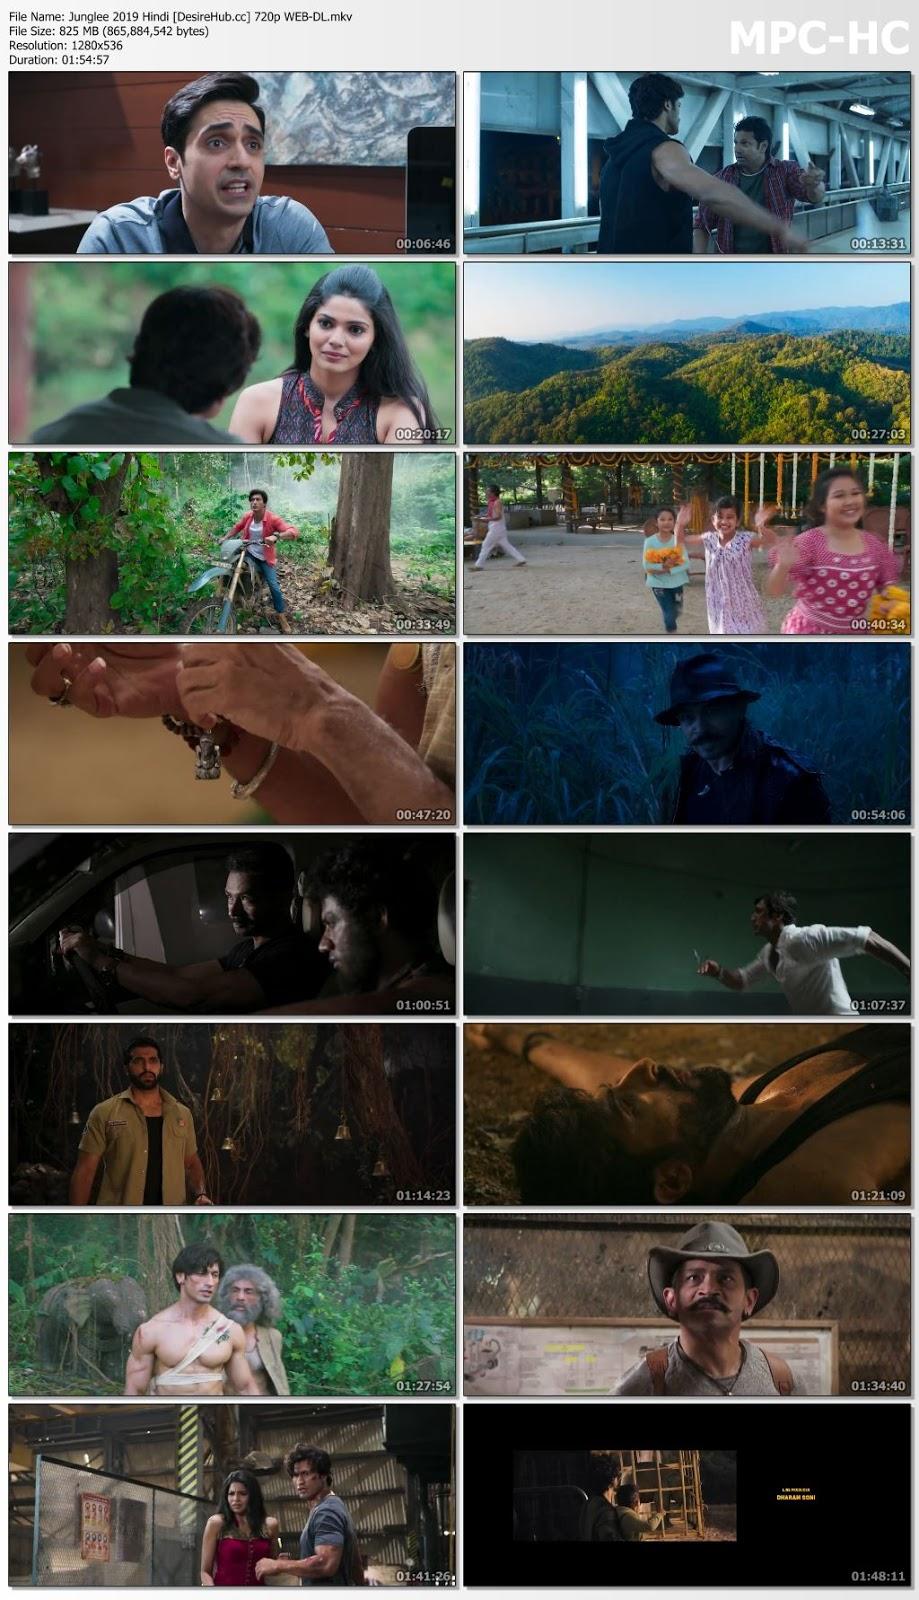 Junglee 2019 Hindi 720p WEB-DL 800MB Desirehub